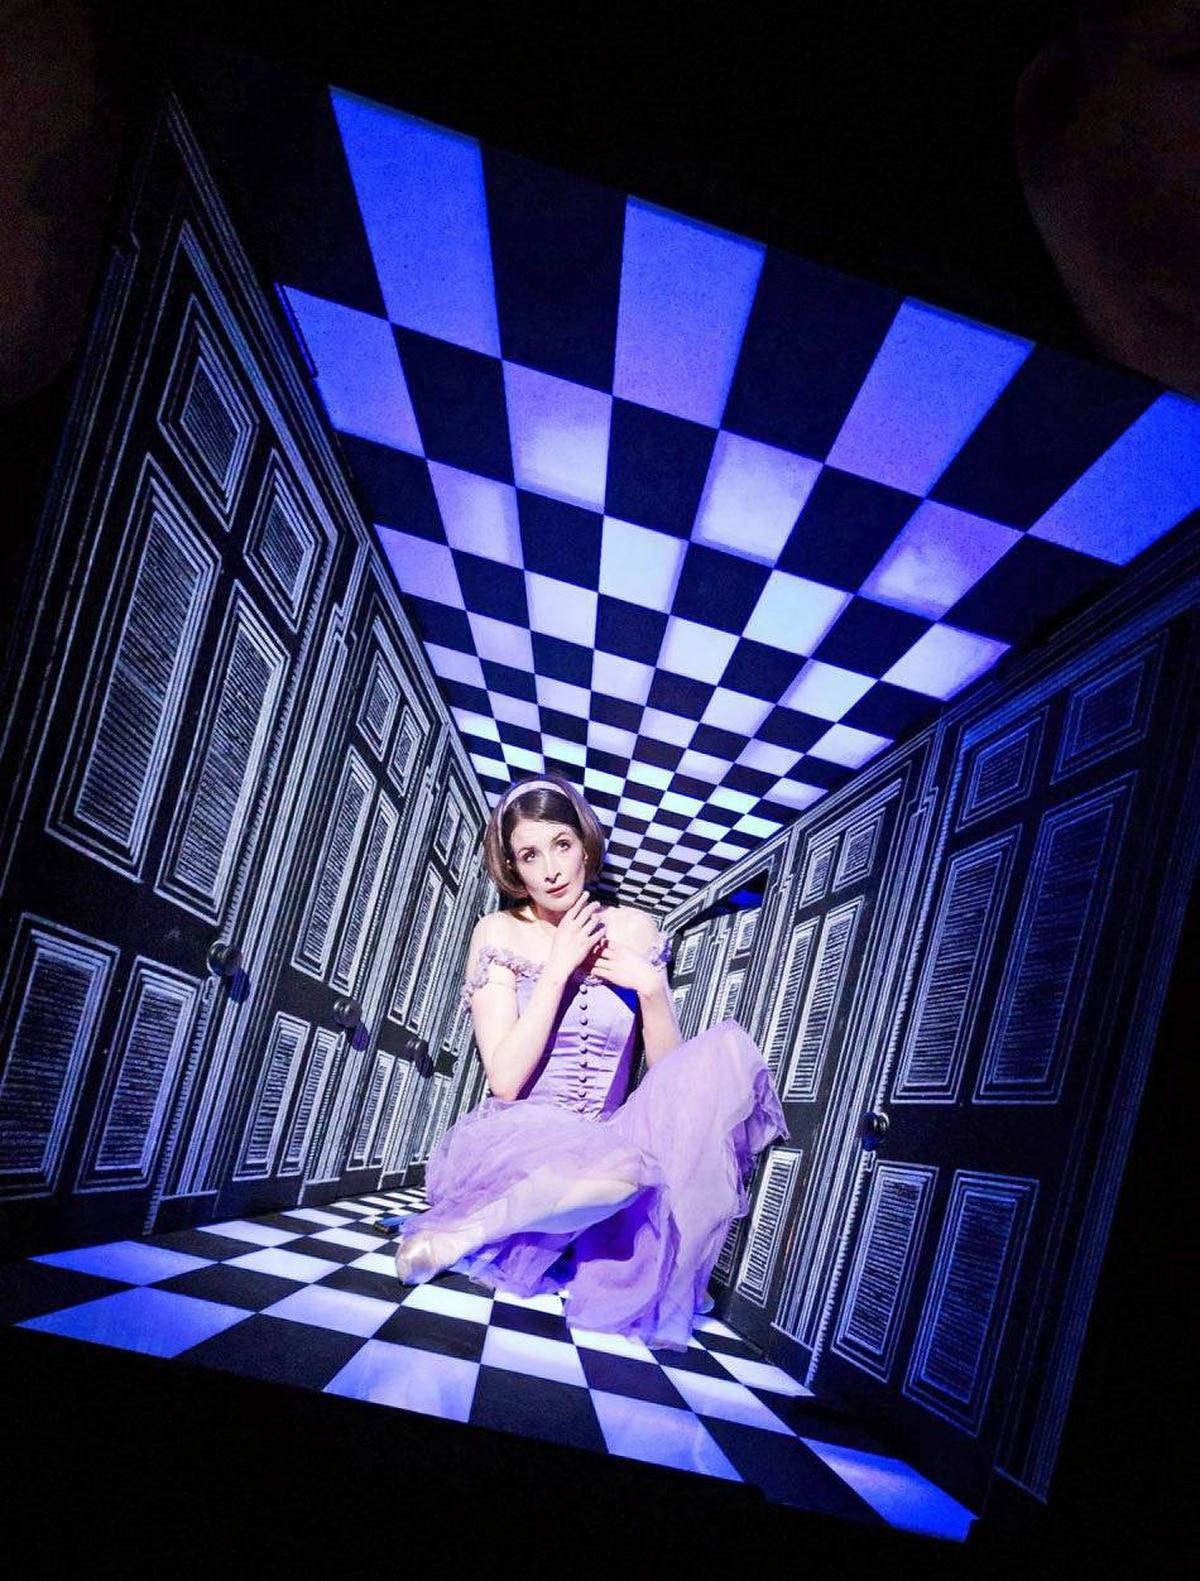 In June, Luminato hosts the National Ballet's Canadian premiere of Allice's Adventures in Wonderland.